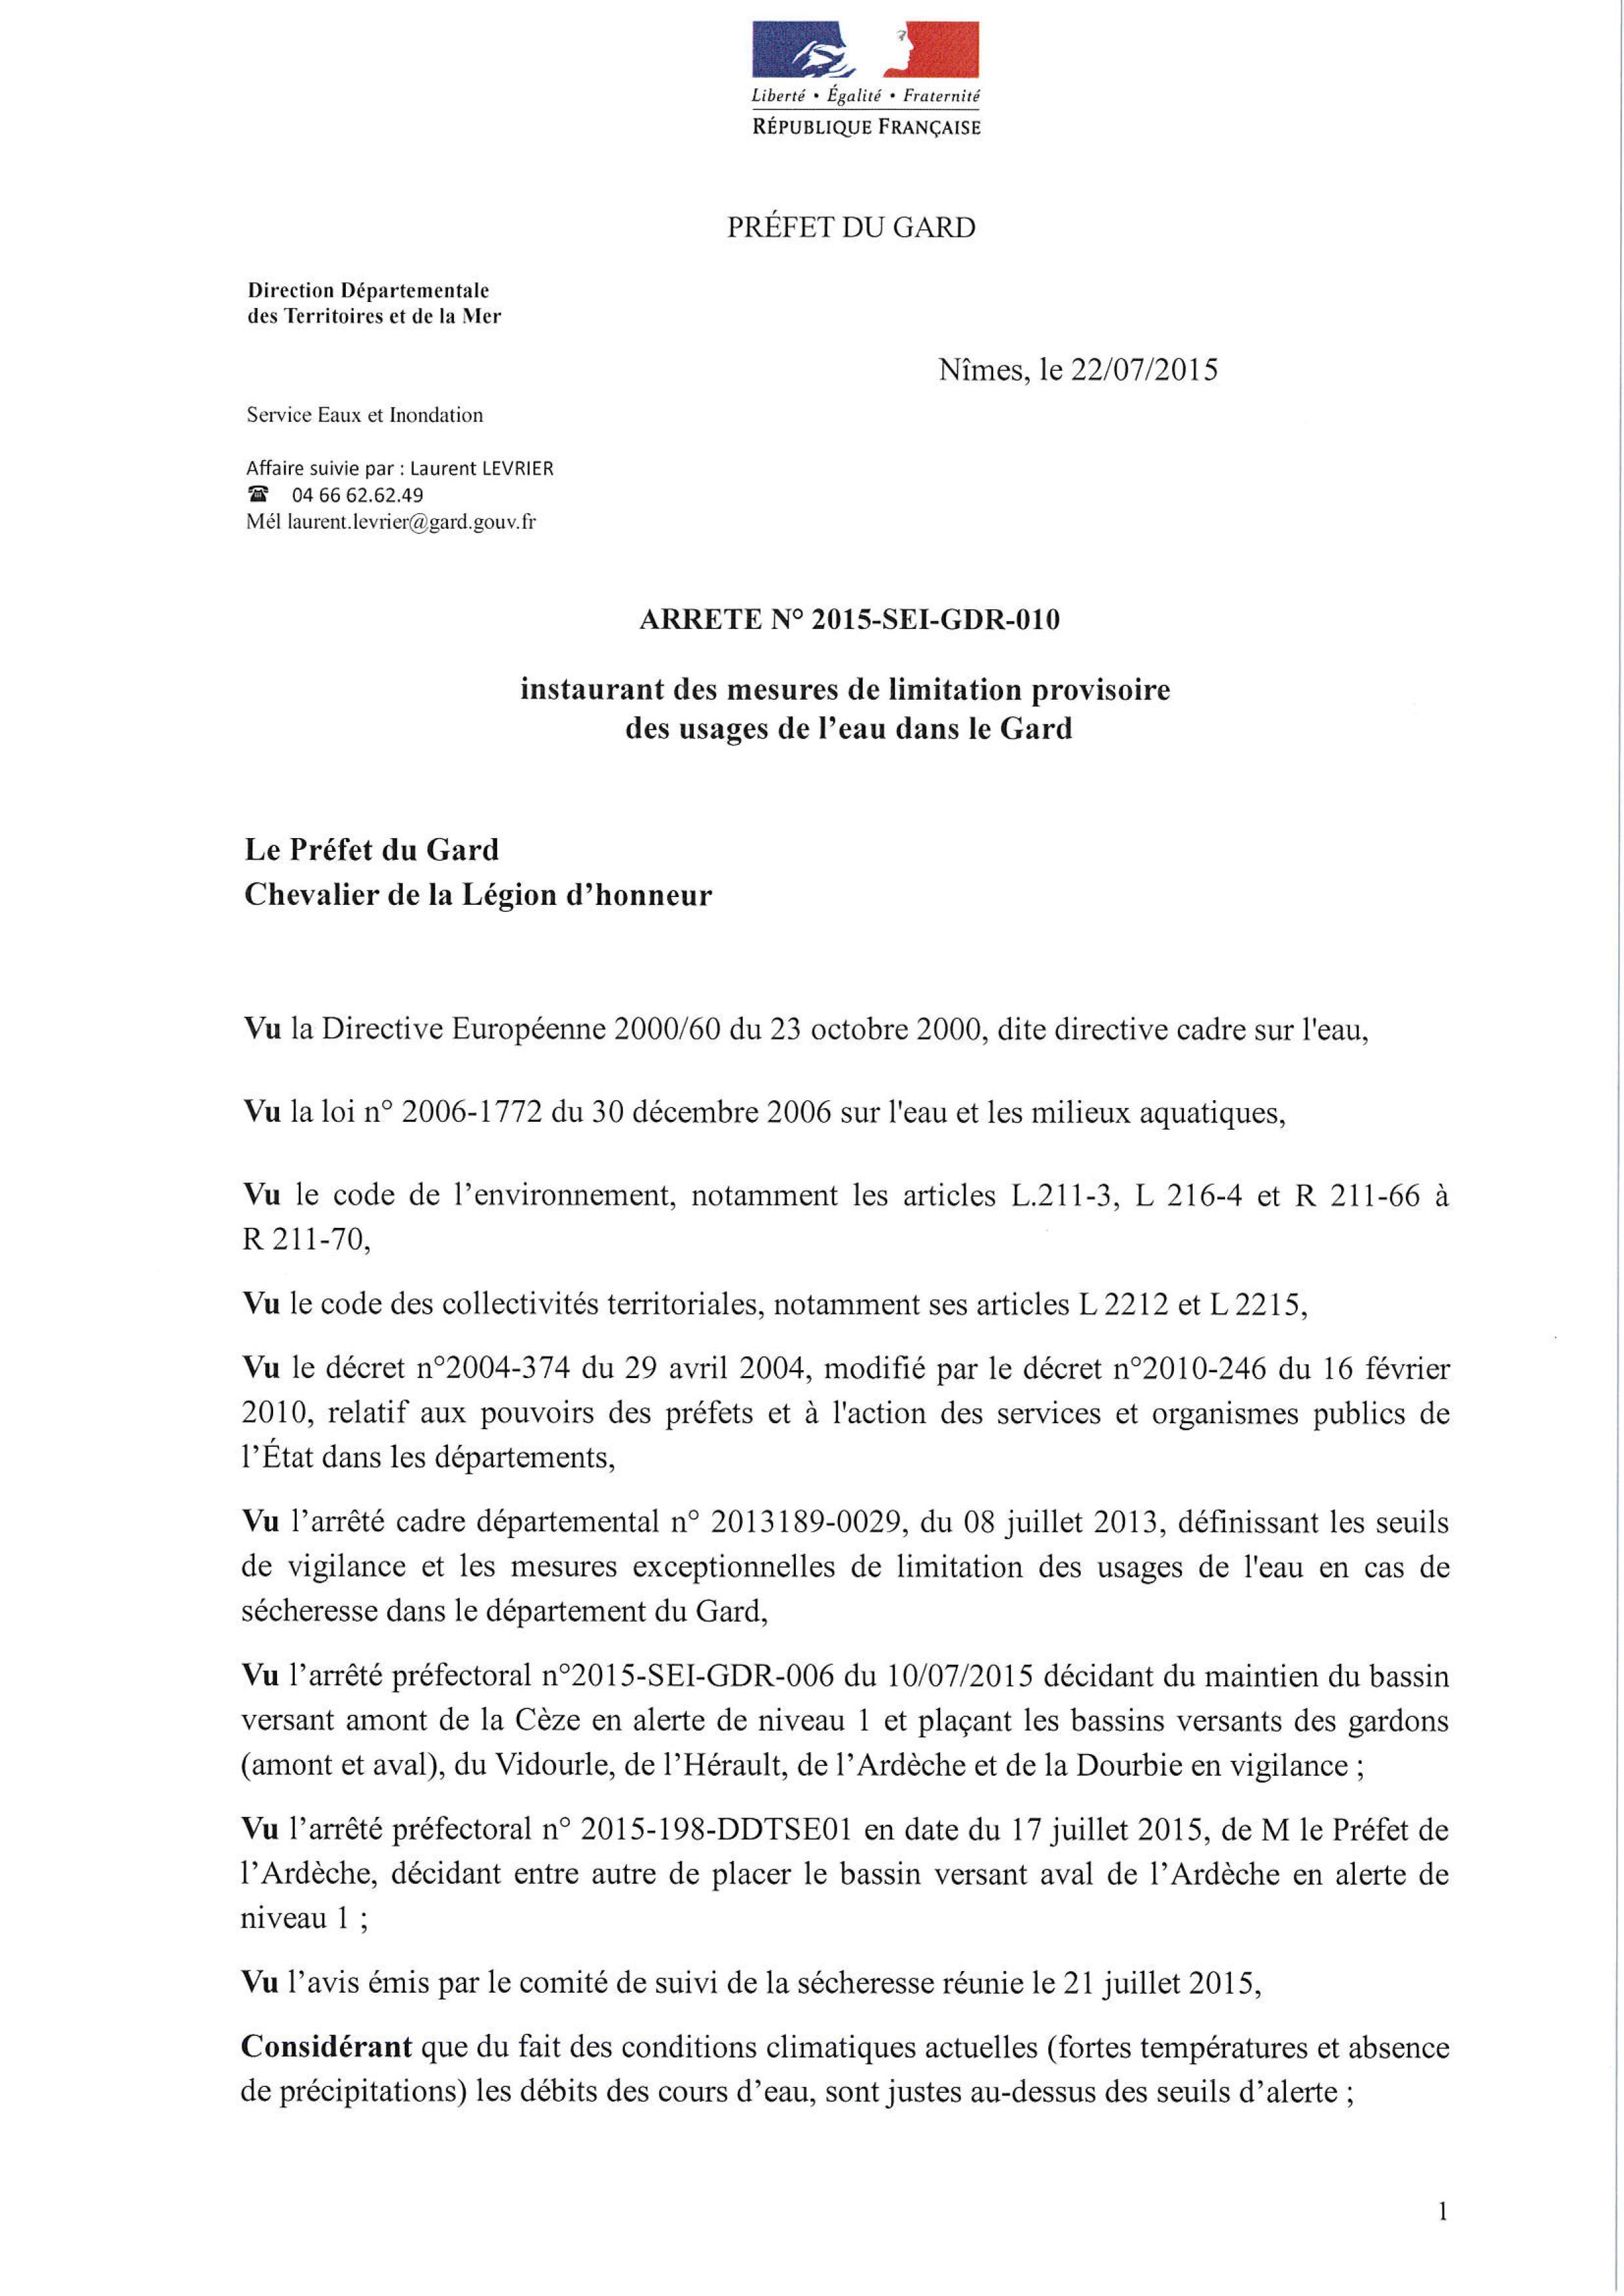 AP_20150721_corp_arrete_restriction_secheresse_GARD_signé_01